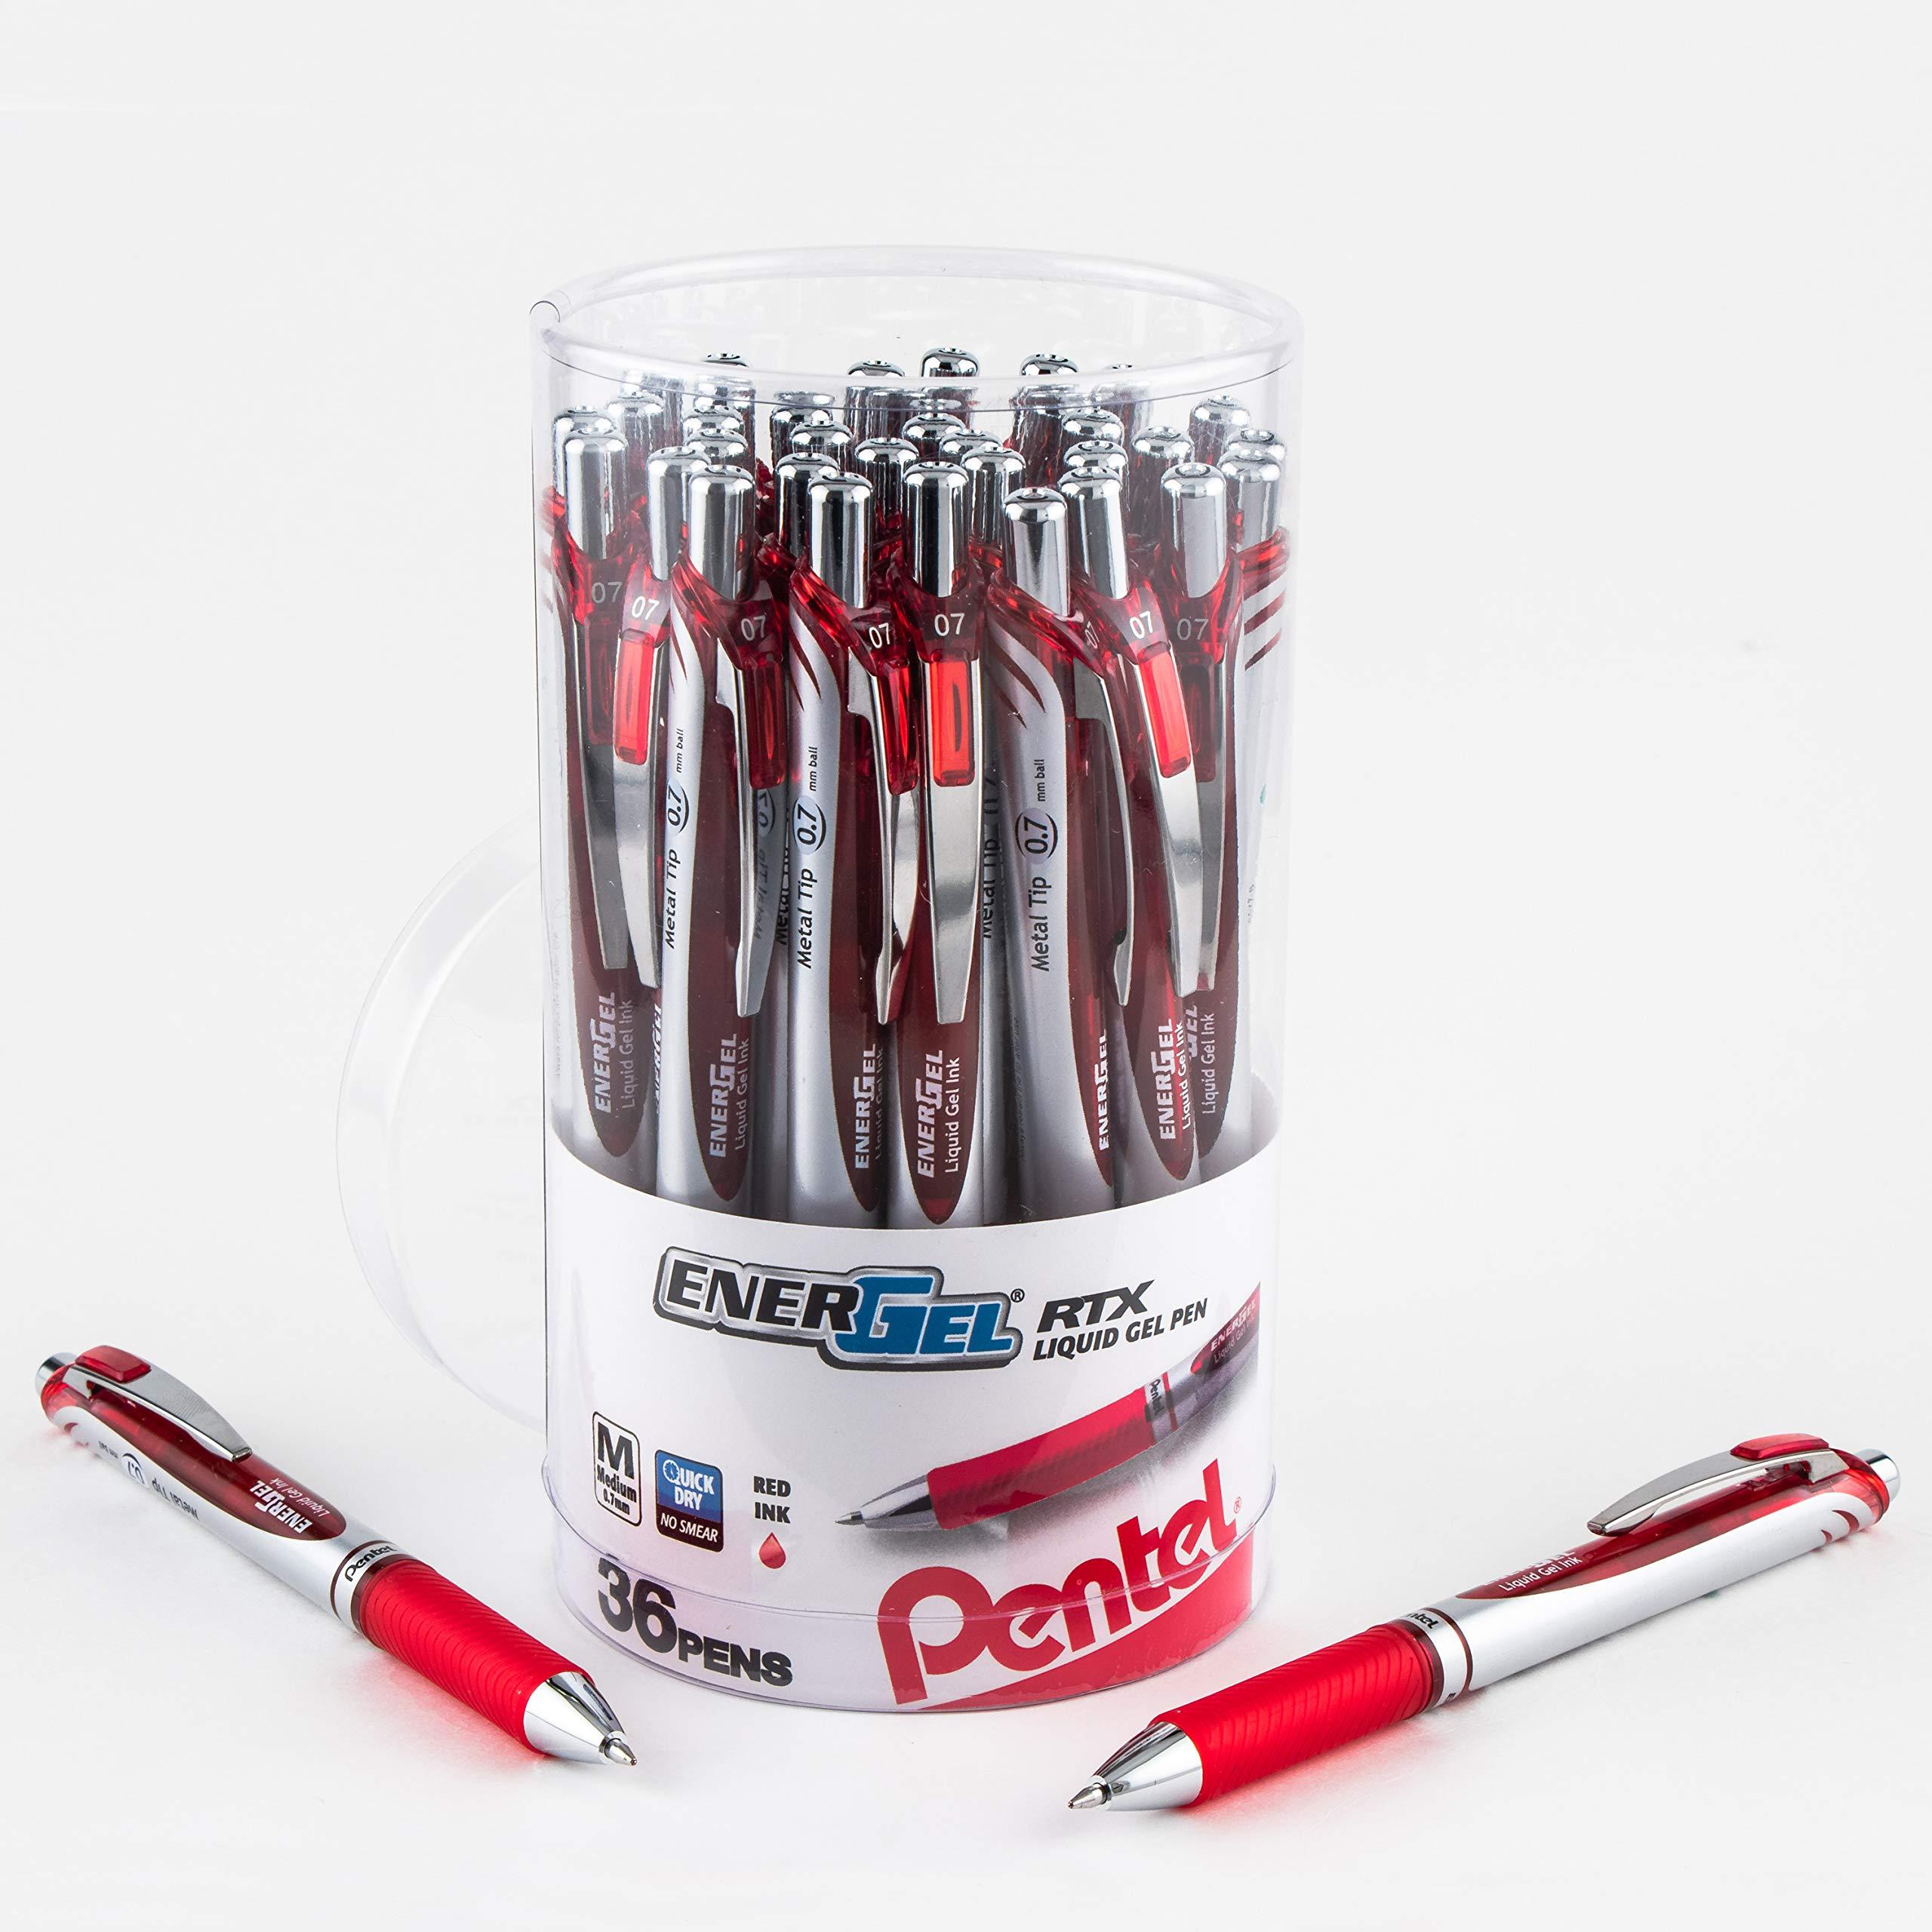 Pentel EnerGel RTX Retractable Liquid Gel Pen Canister, Red Ink, 36pk (BL77PC36B) by Pentel (Image #1)